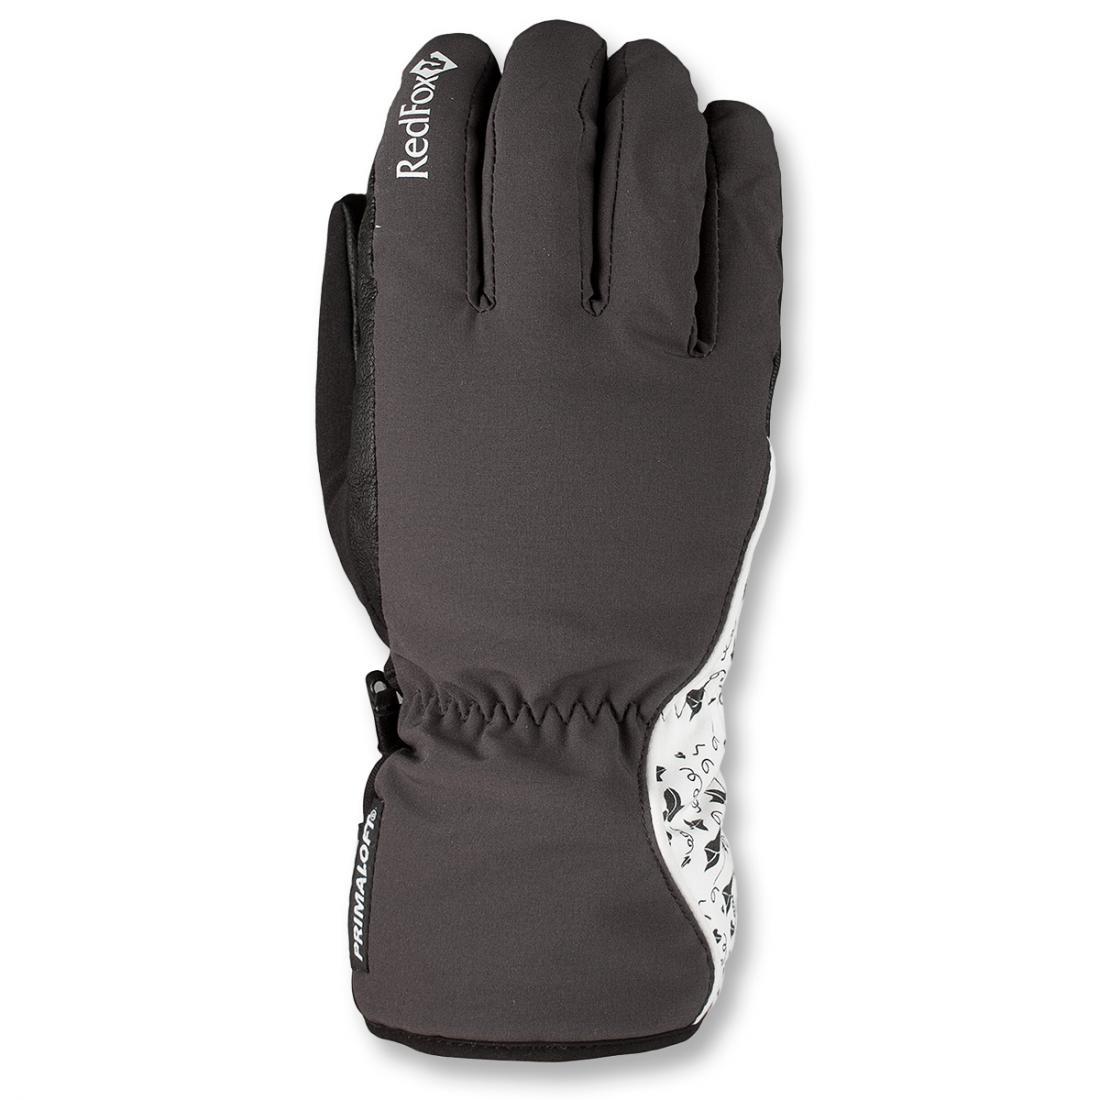 Перчатки женские RozaryПерчатки<br><br> Женская версия зимних прогулочных перчаток с утеплителем Primaloft®.<br><br><br> <br><br><br><br><br> Материал – Nylon DWR.<br><br> <br><br><br> Утеплитель – Primaloft®.<br><br> <br><br><br> Вставки, препятствующ...<br><br>Цвет: Белый<br>Размер: M